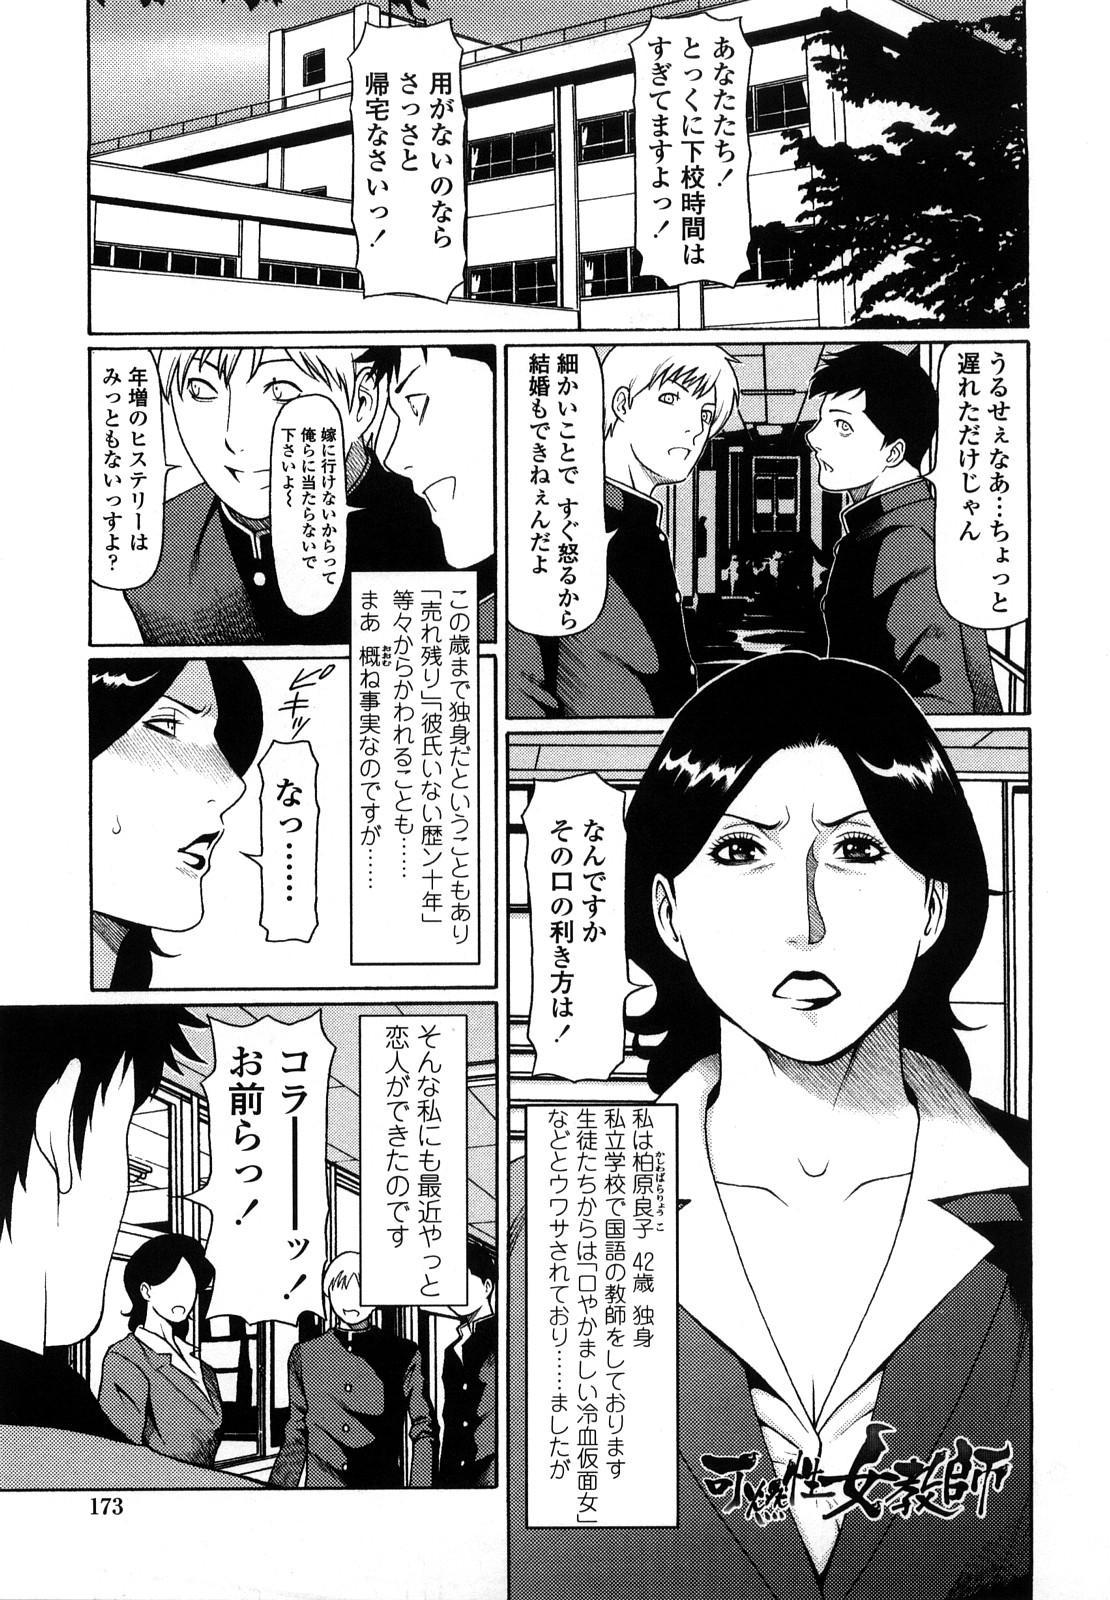 [Takasugi Kou] Kindan no Haha-Ana - Immorality Love-Hole [Decensored] 174